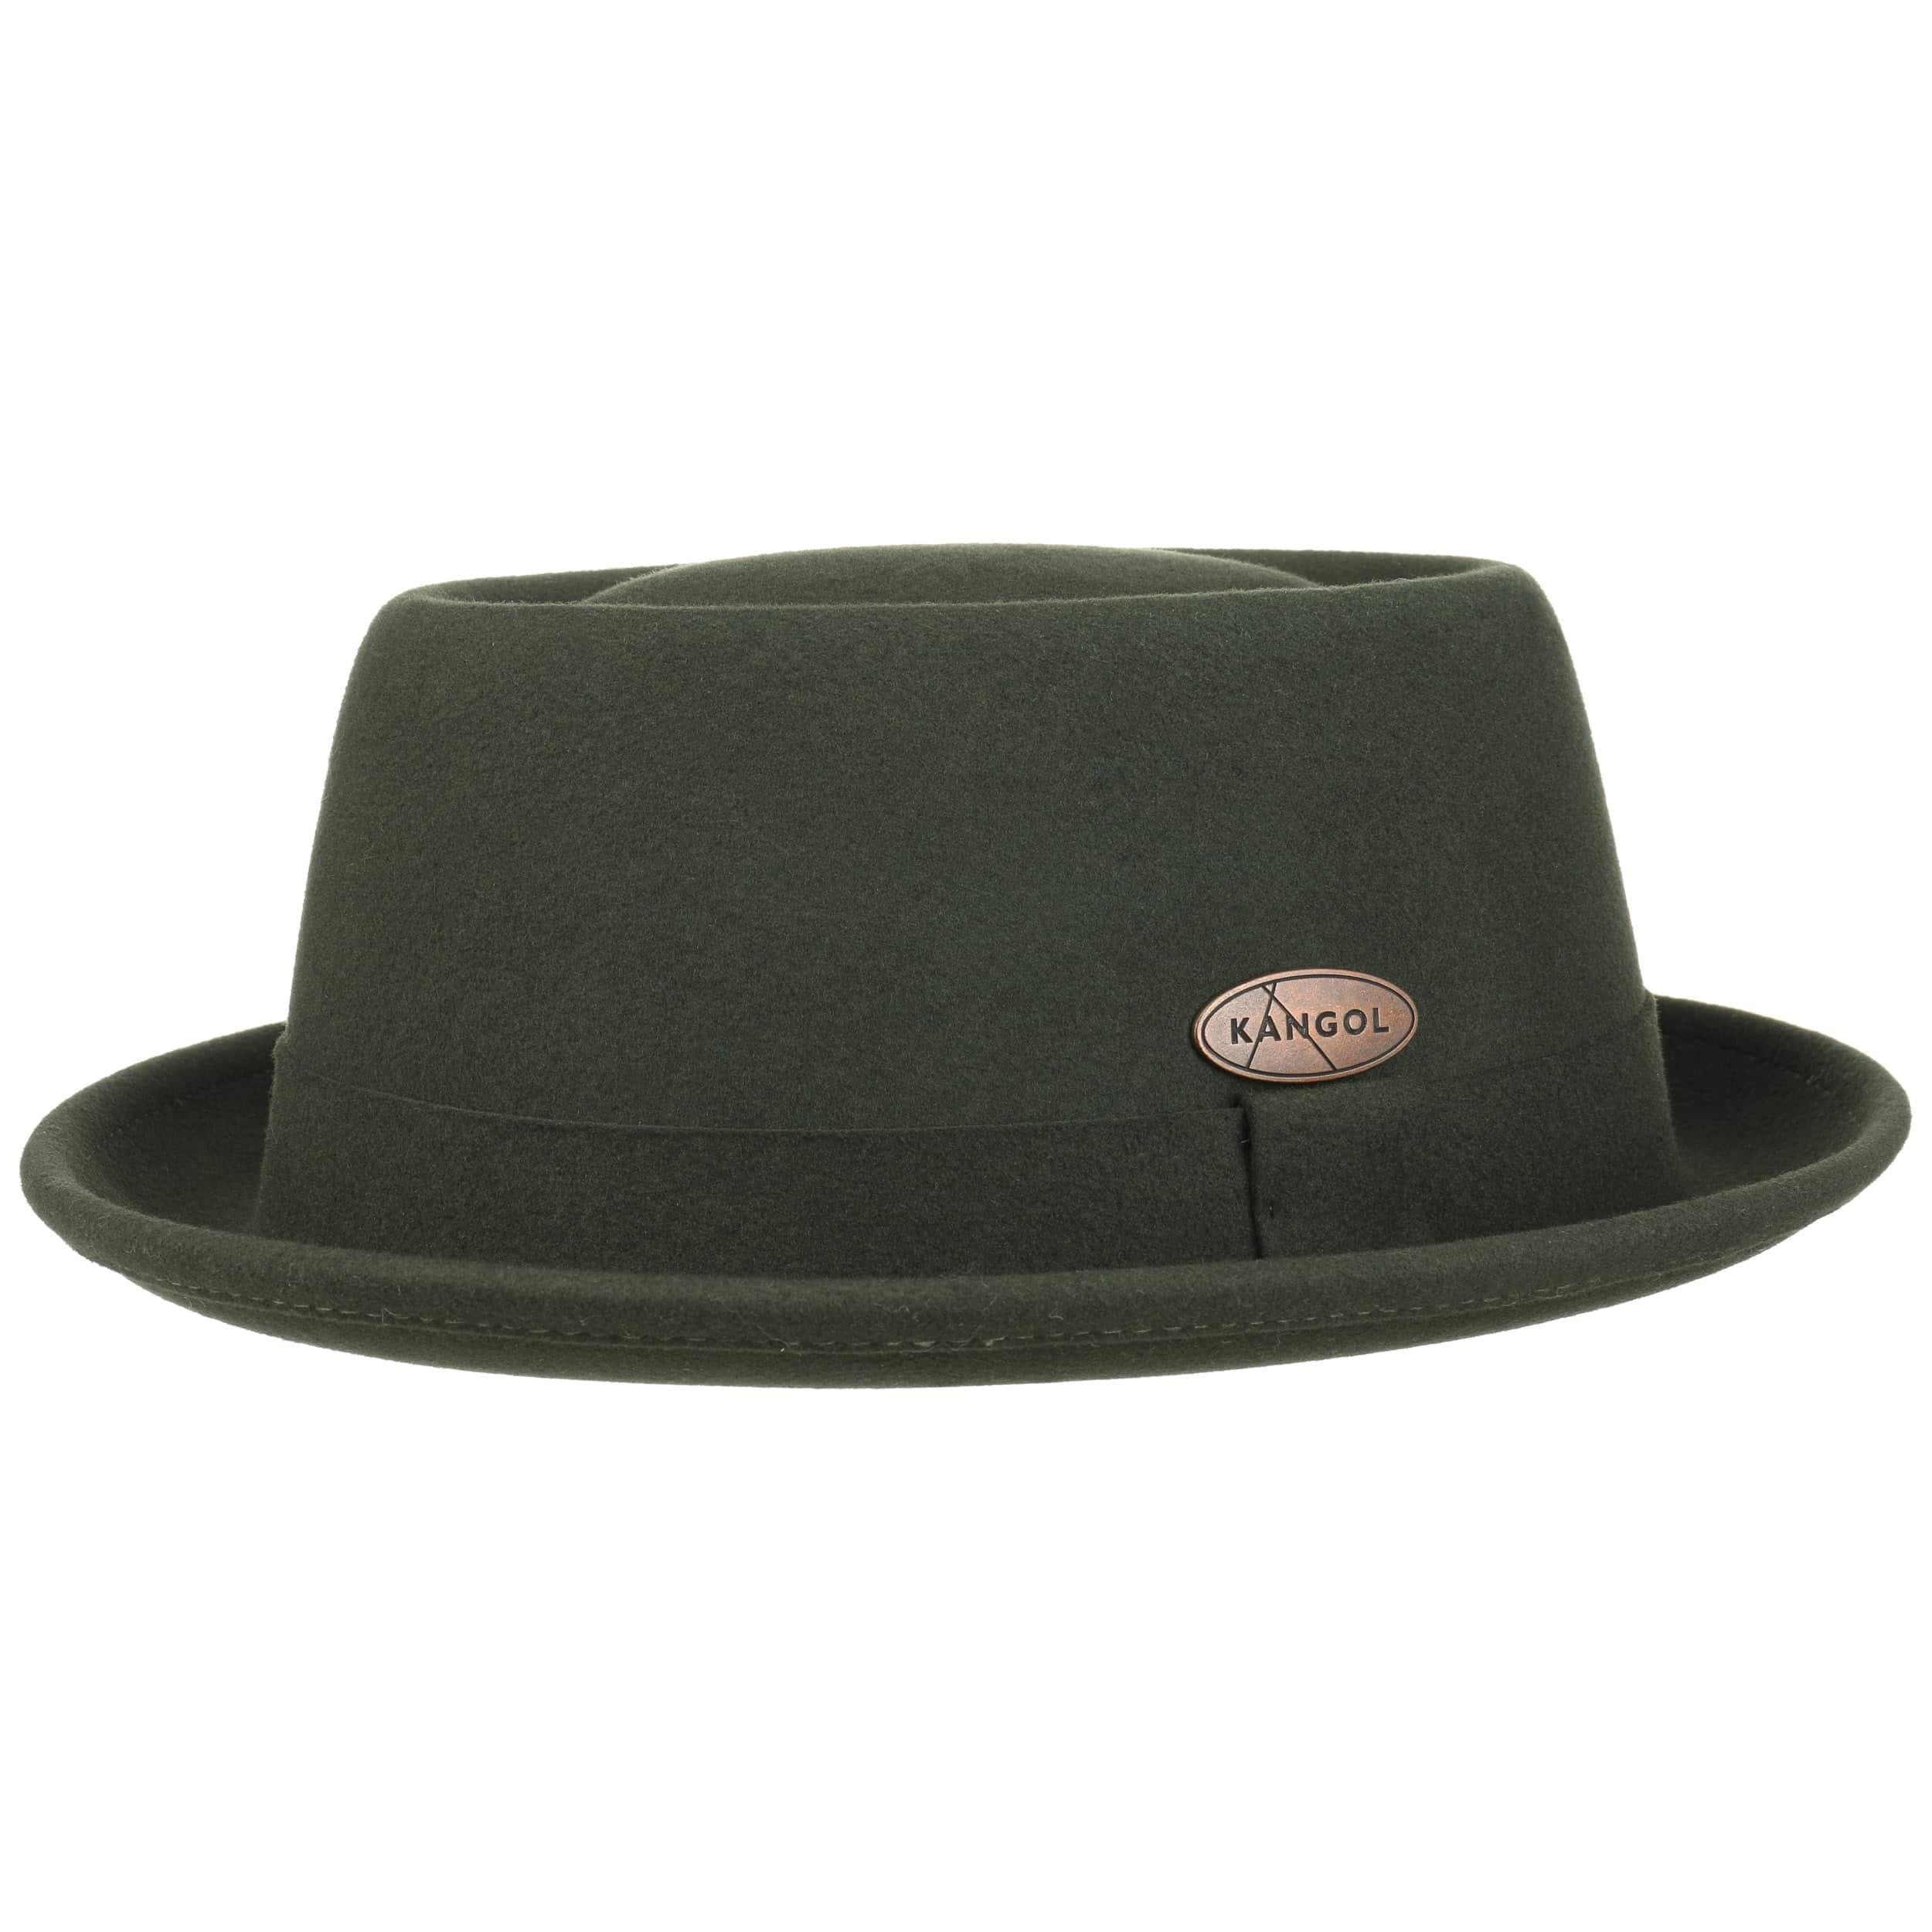 ... Lite Felt Pork Pie Hat by Kangol - dark green 4 ... c93d416505e